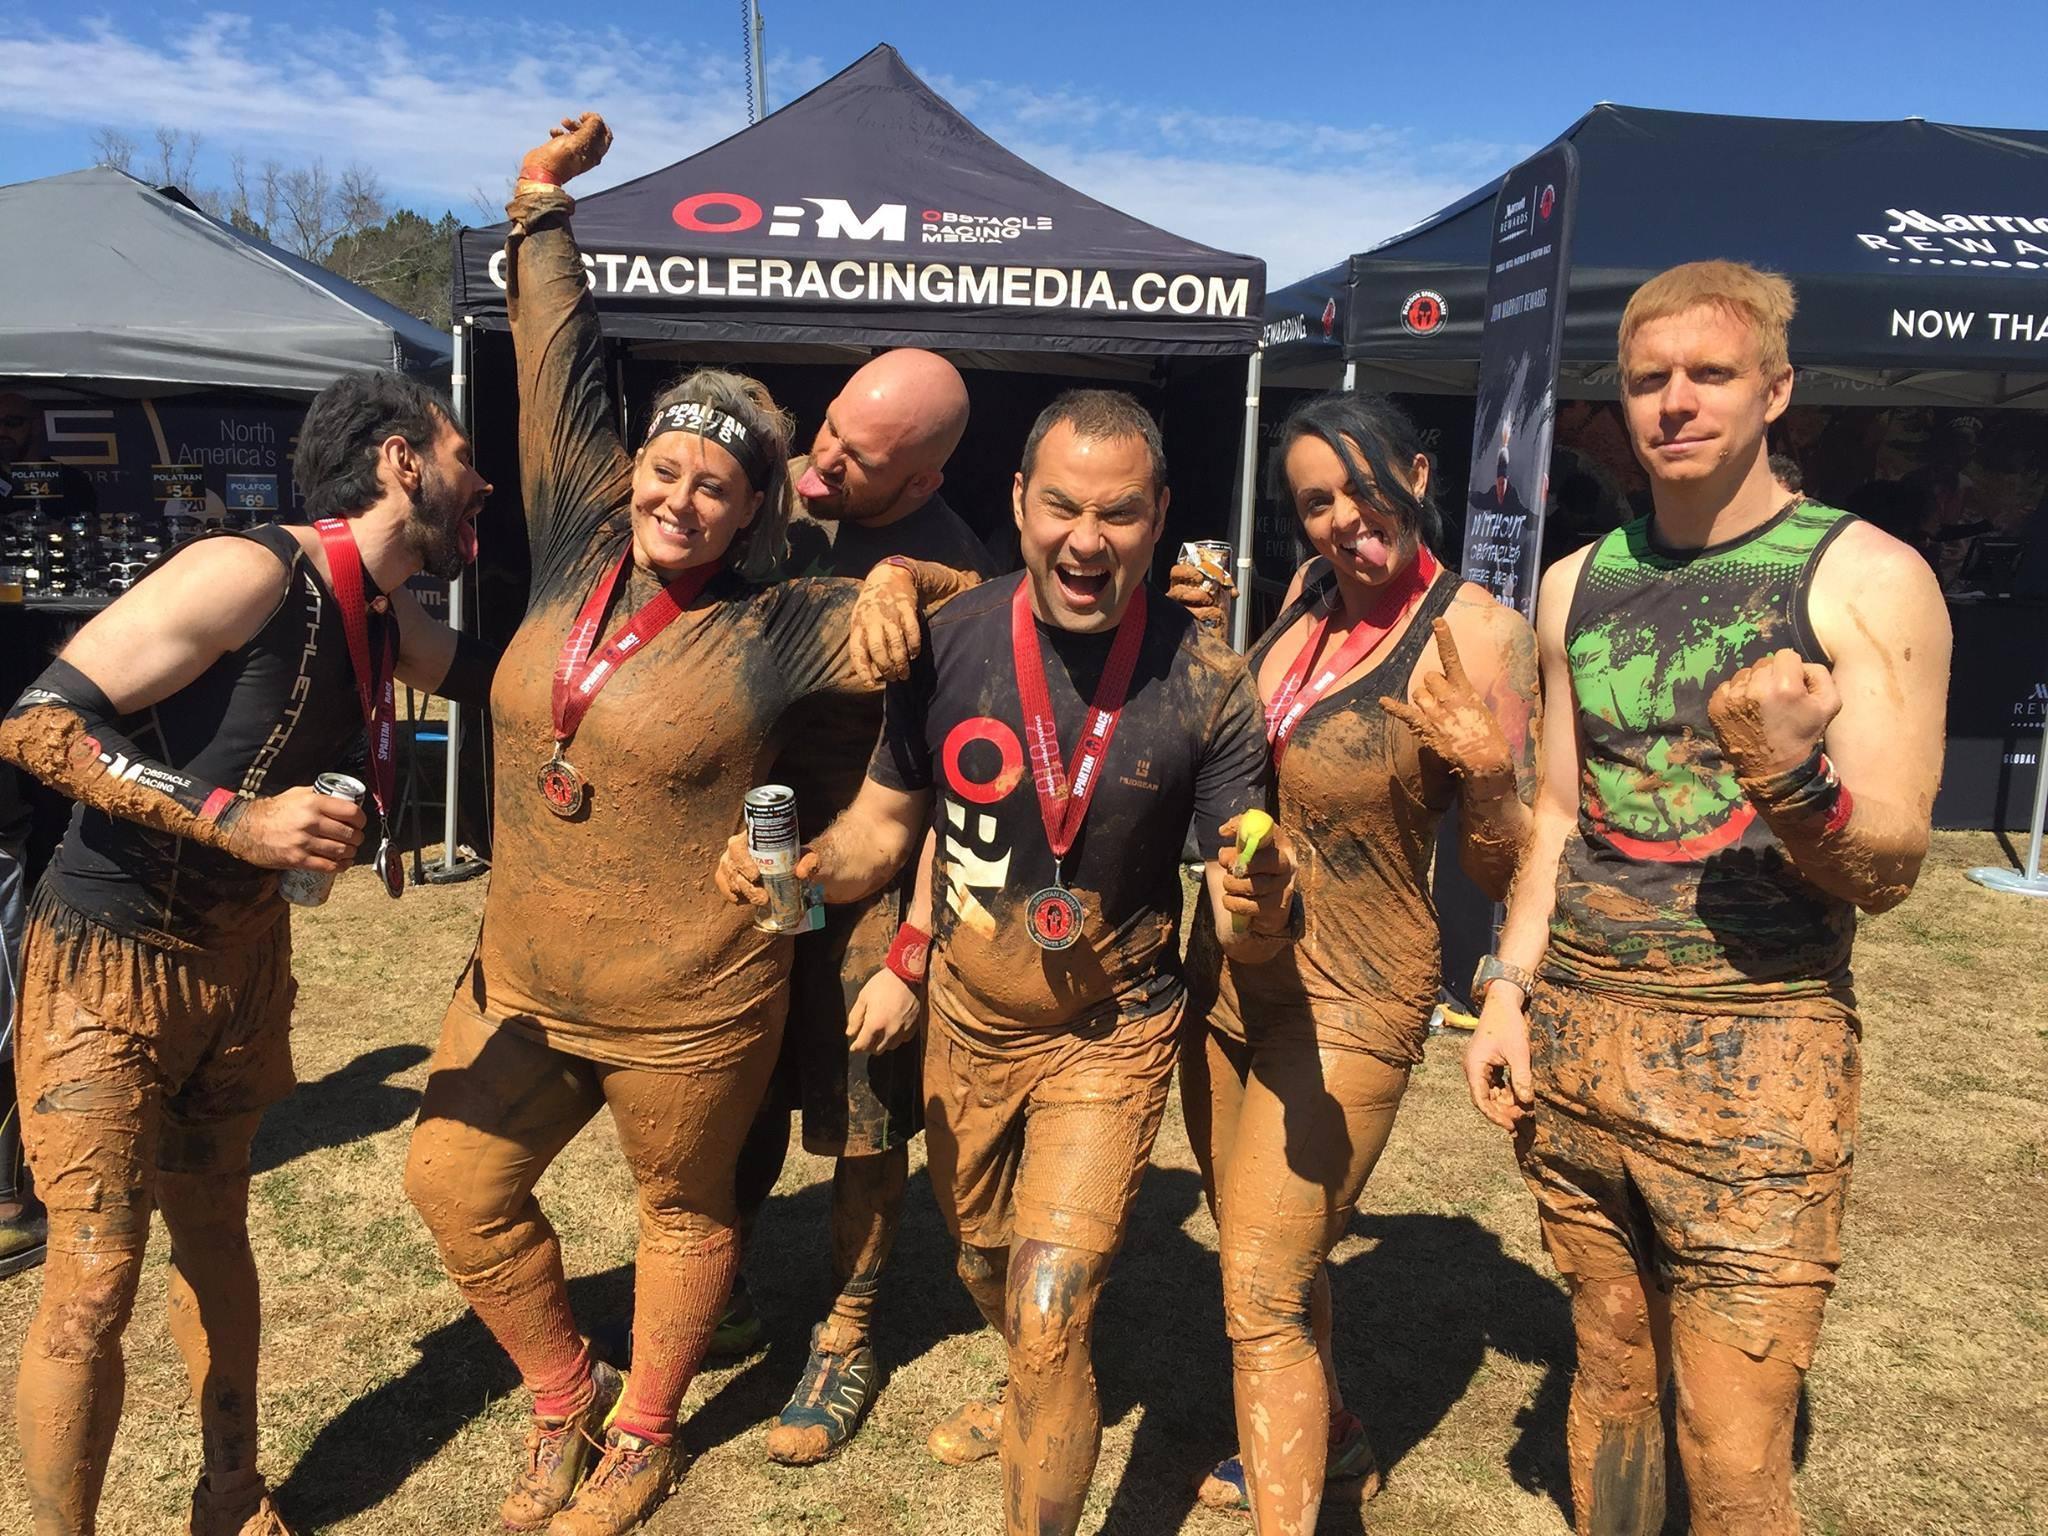 Spartan Race - Atlanta - Team ORM